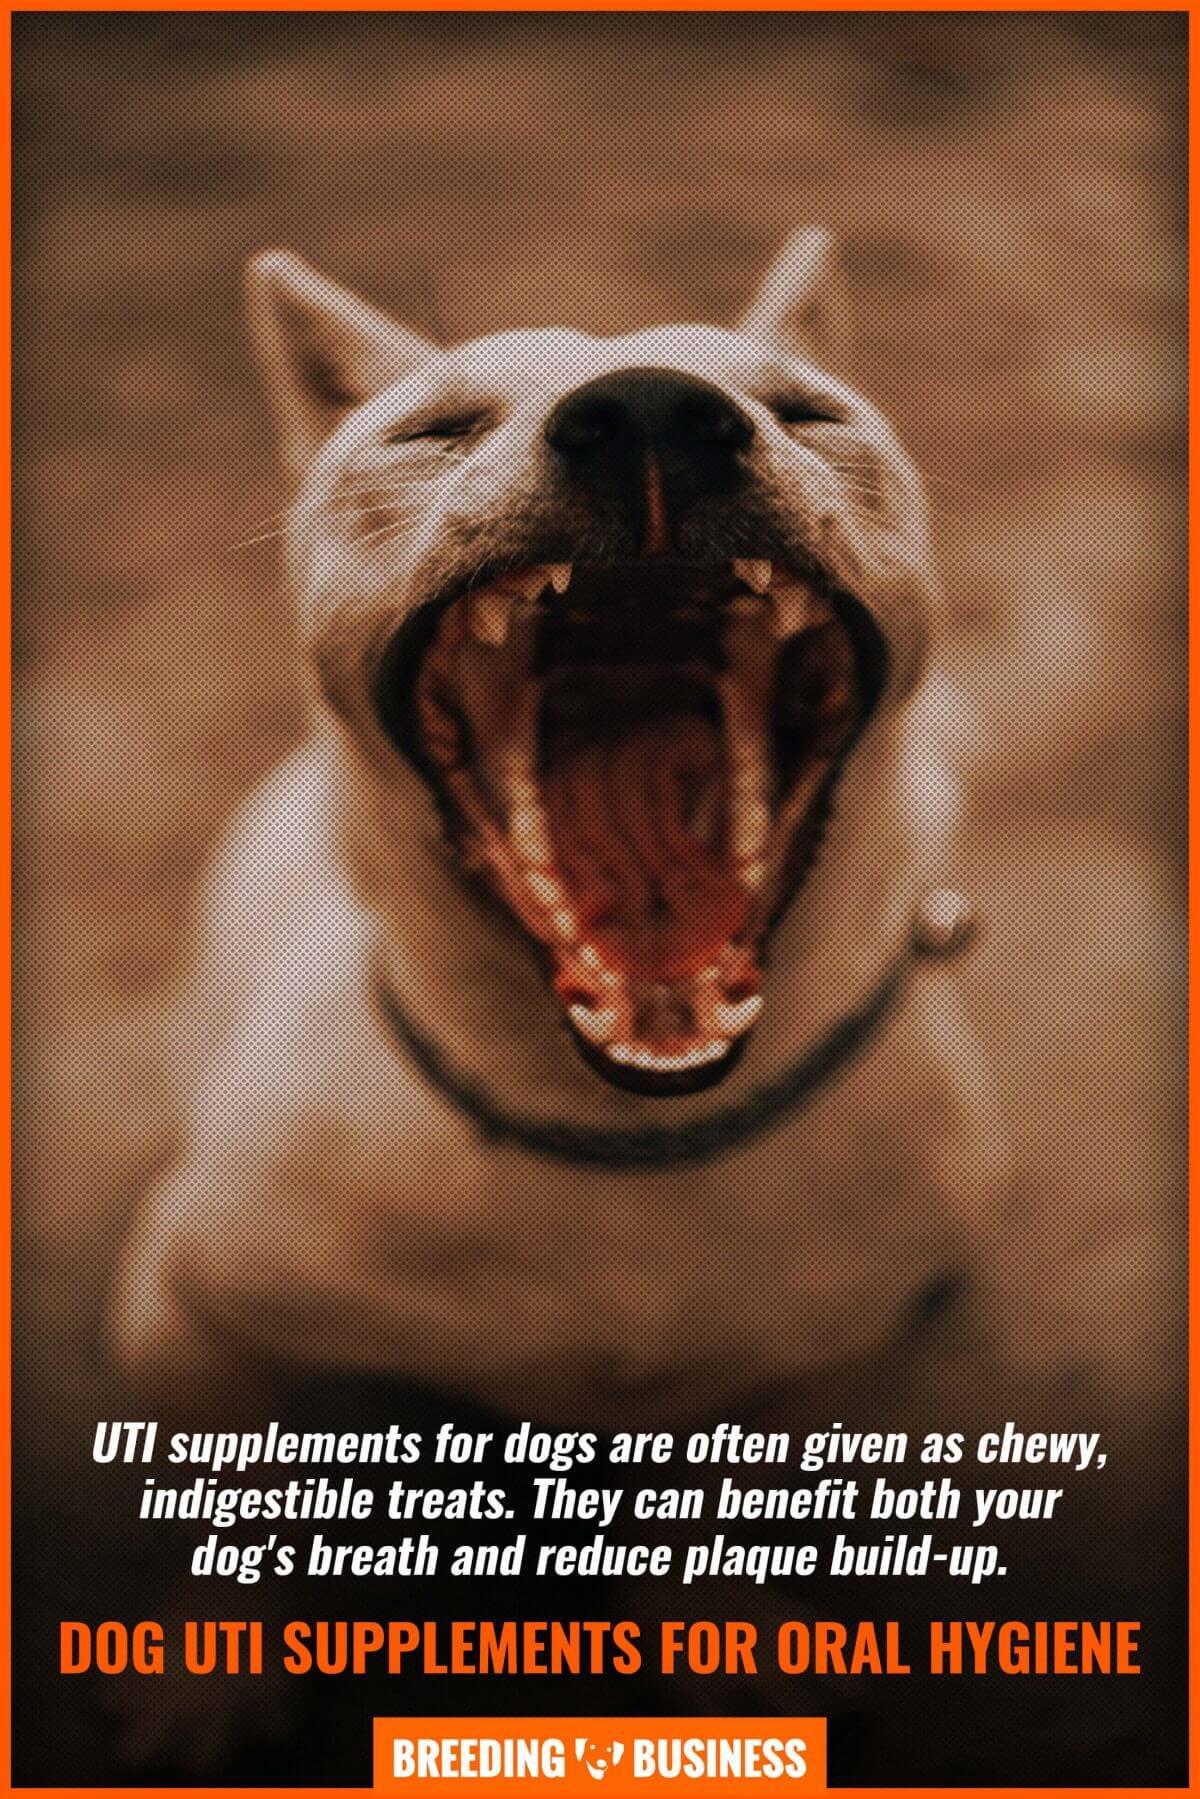 dog uti supplements for oral hygiene